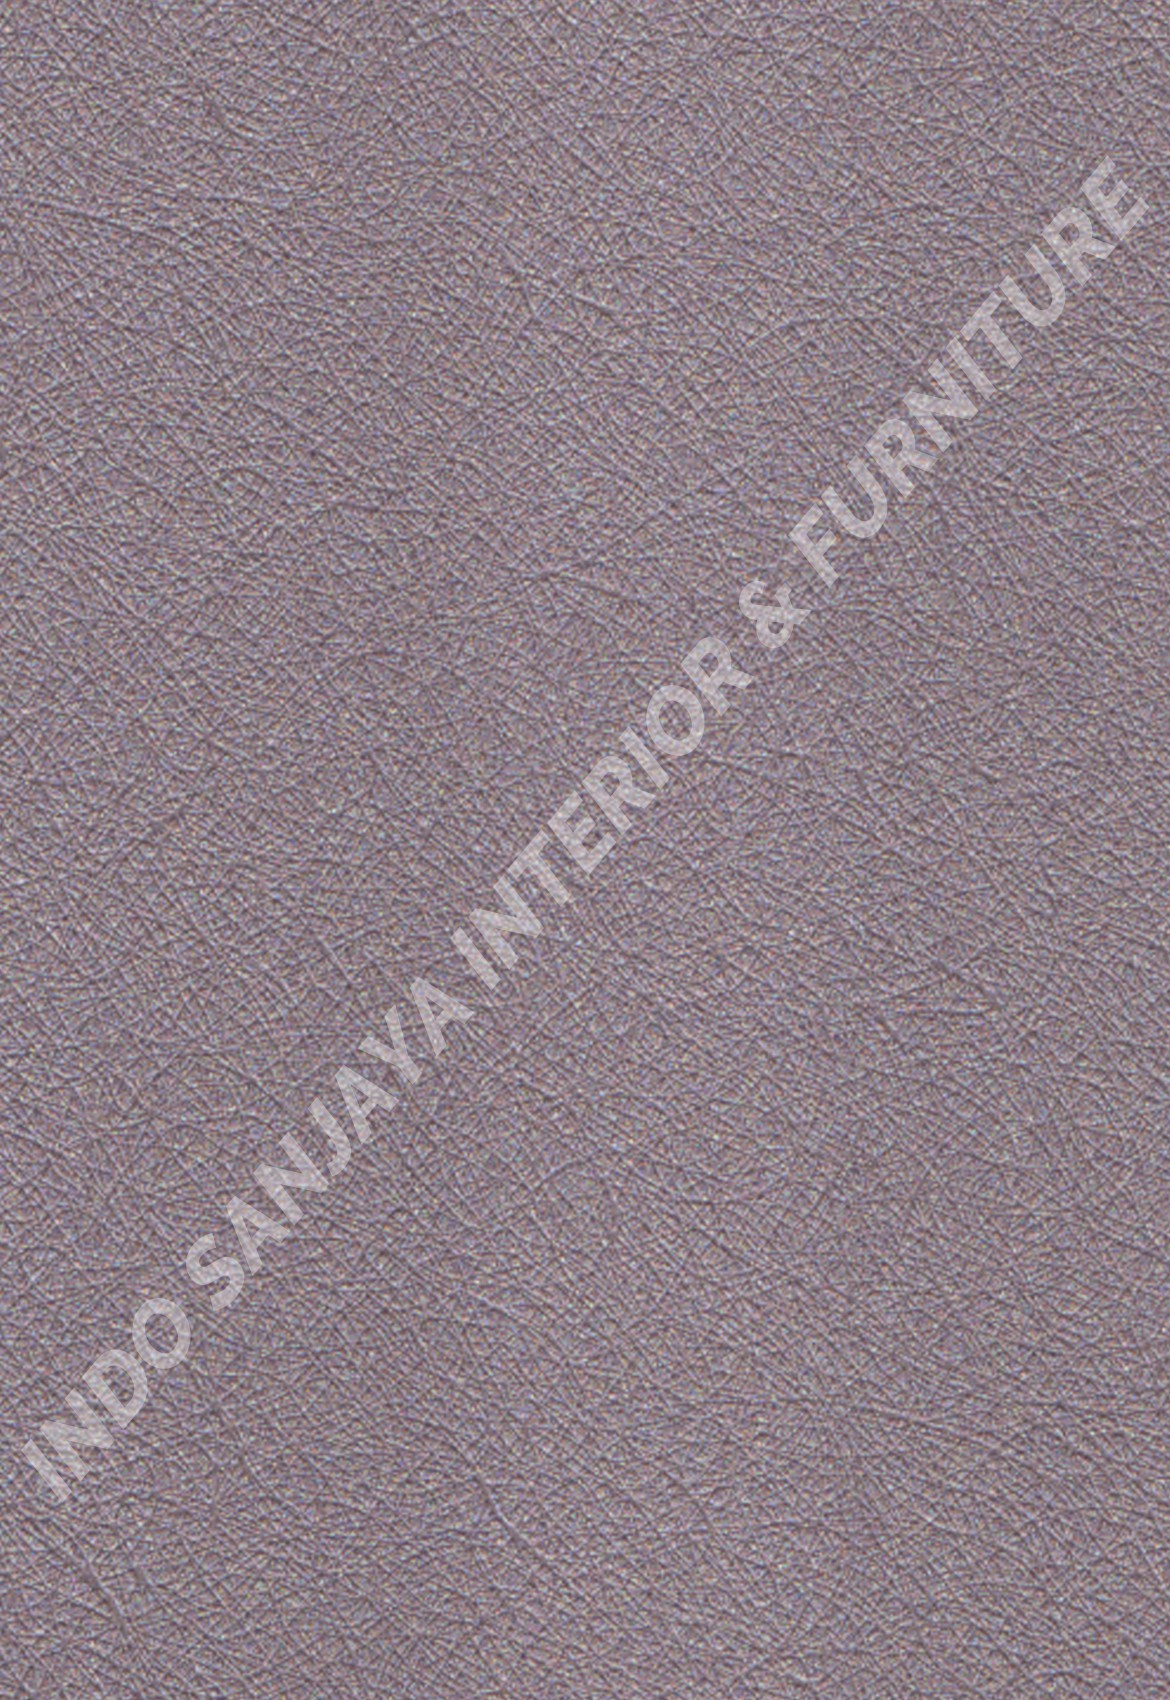 wallpaper   Wallpaper Minimalis Polos 83129-2:83129-2 corak  warna